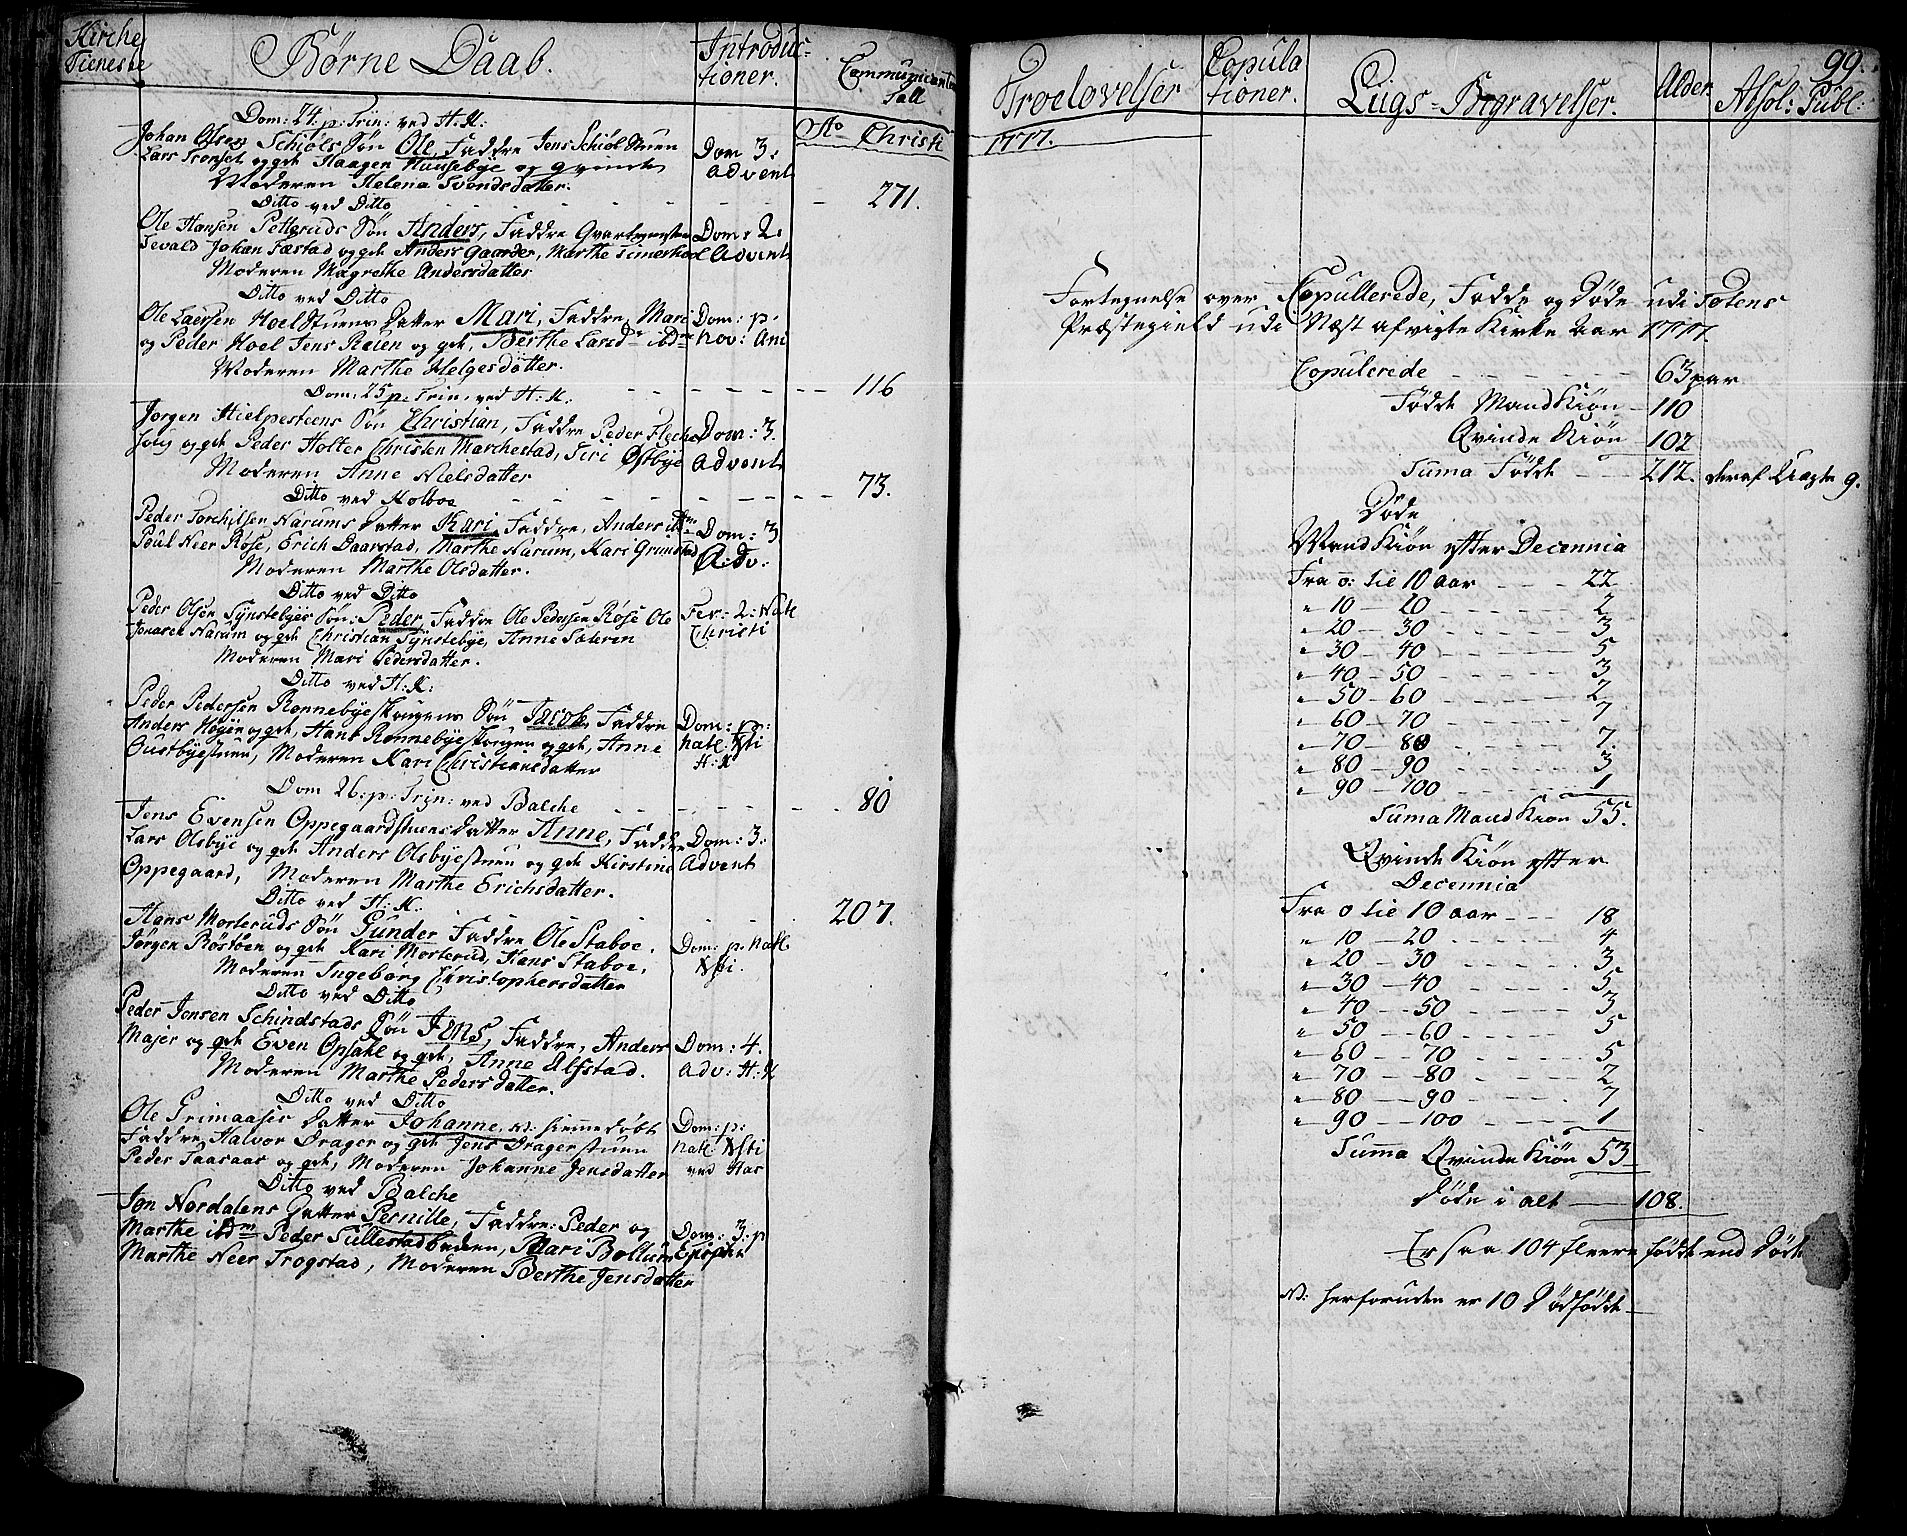 SAH, Toten prestekontor, Ministerialbok nr. 6, 1773-1793, s. 99